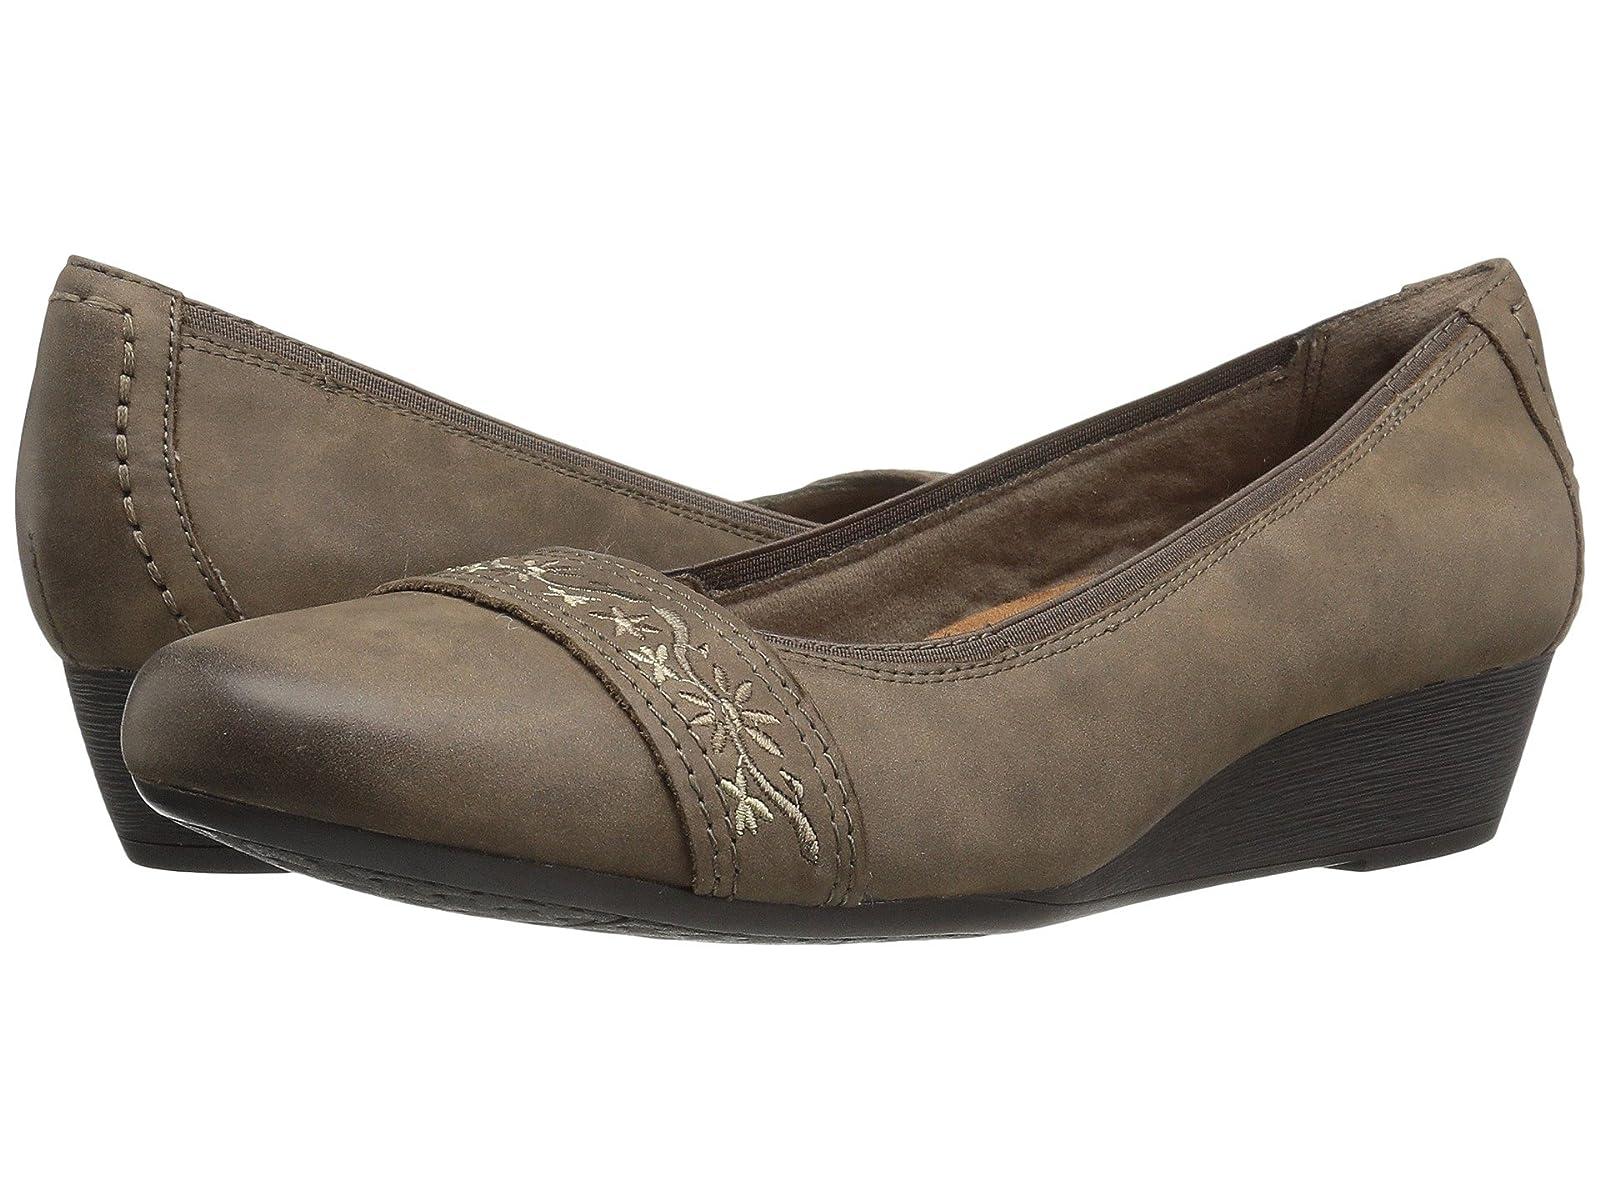 Rockport Cobb Hill Collection Cobb Hill JenniferCheap and distinctive eye-catching shoes